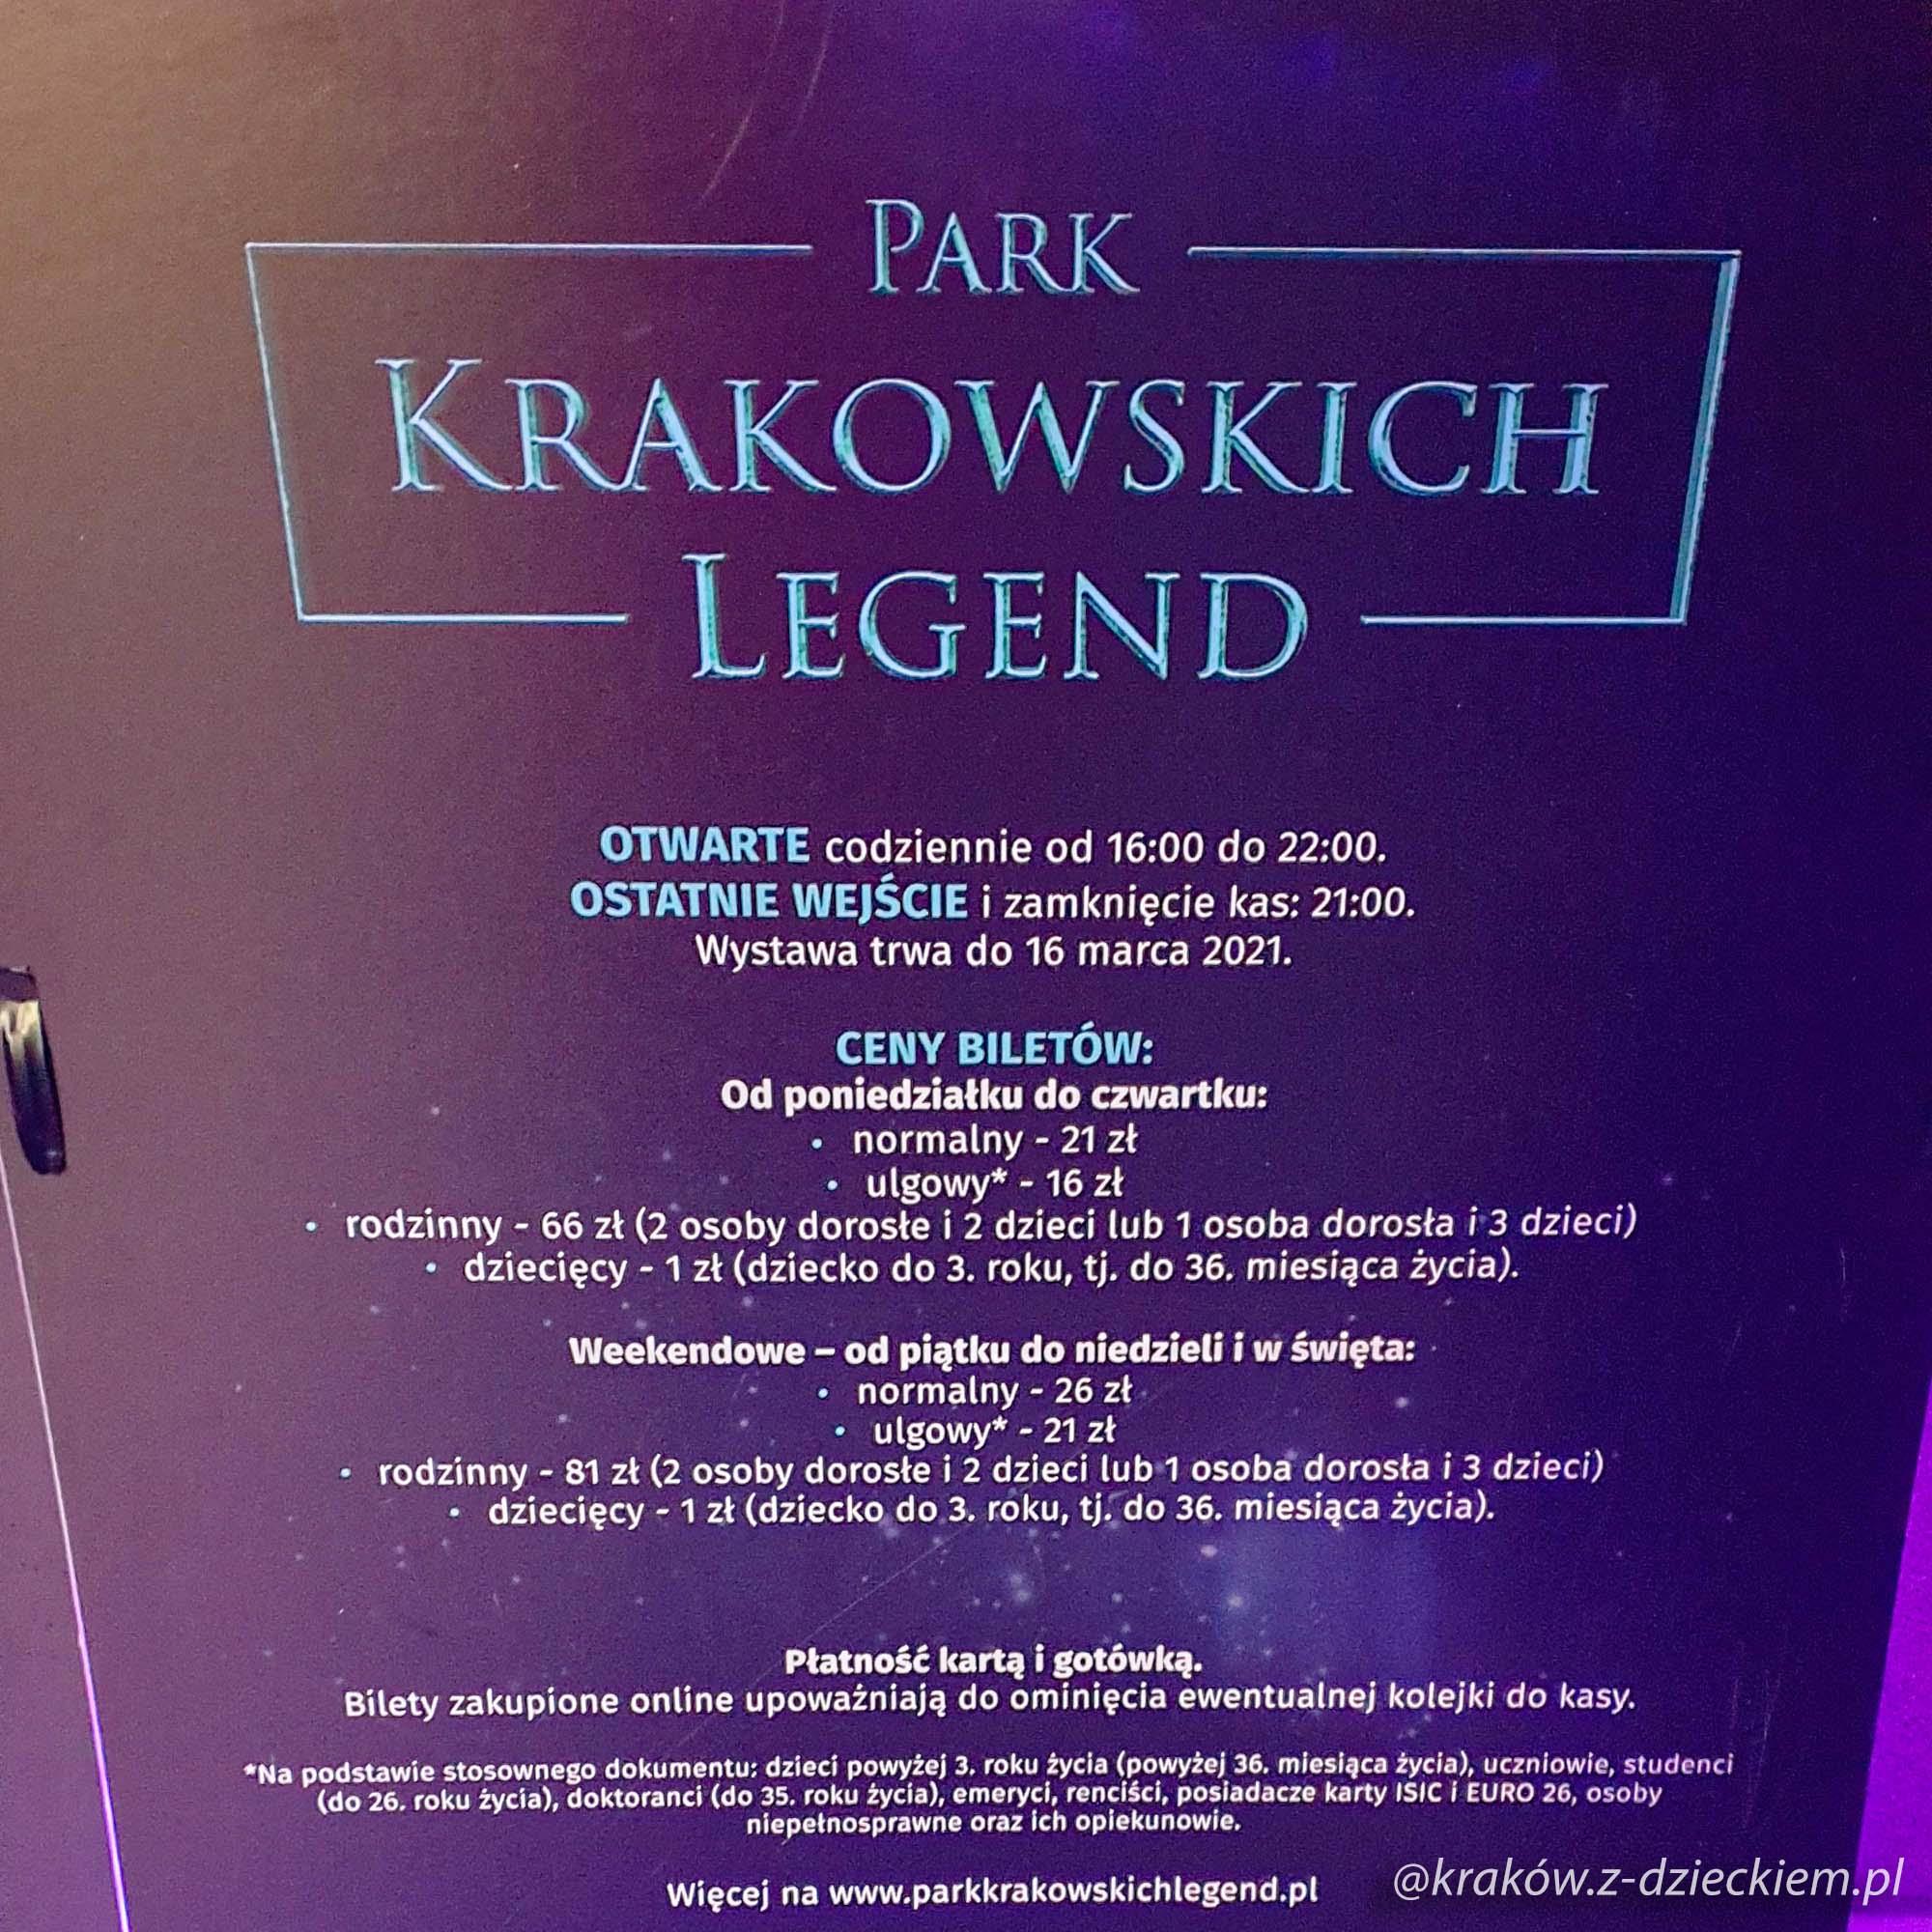 Park Legend Krakowskich